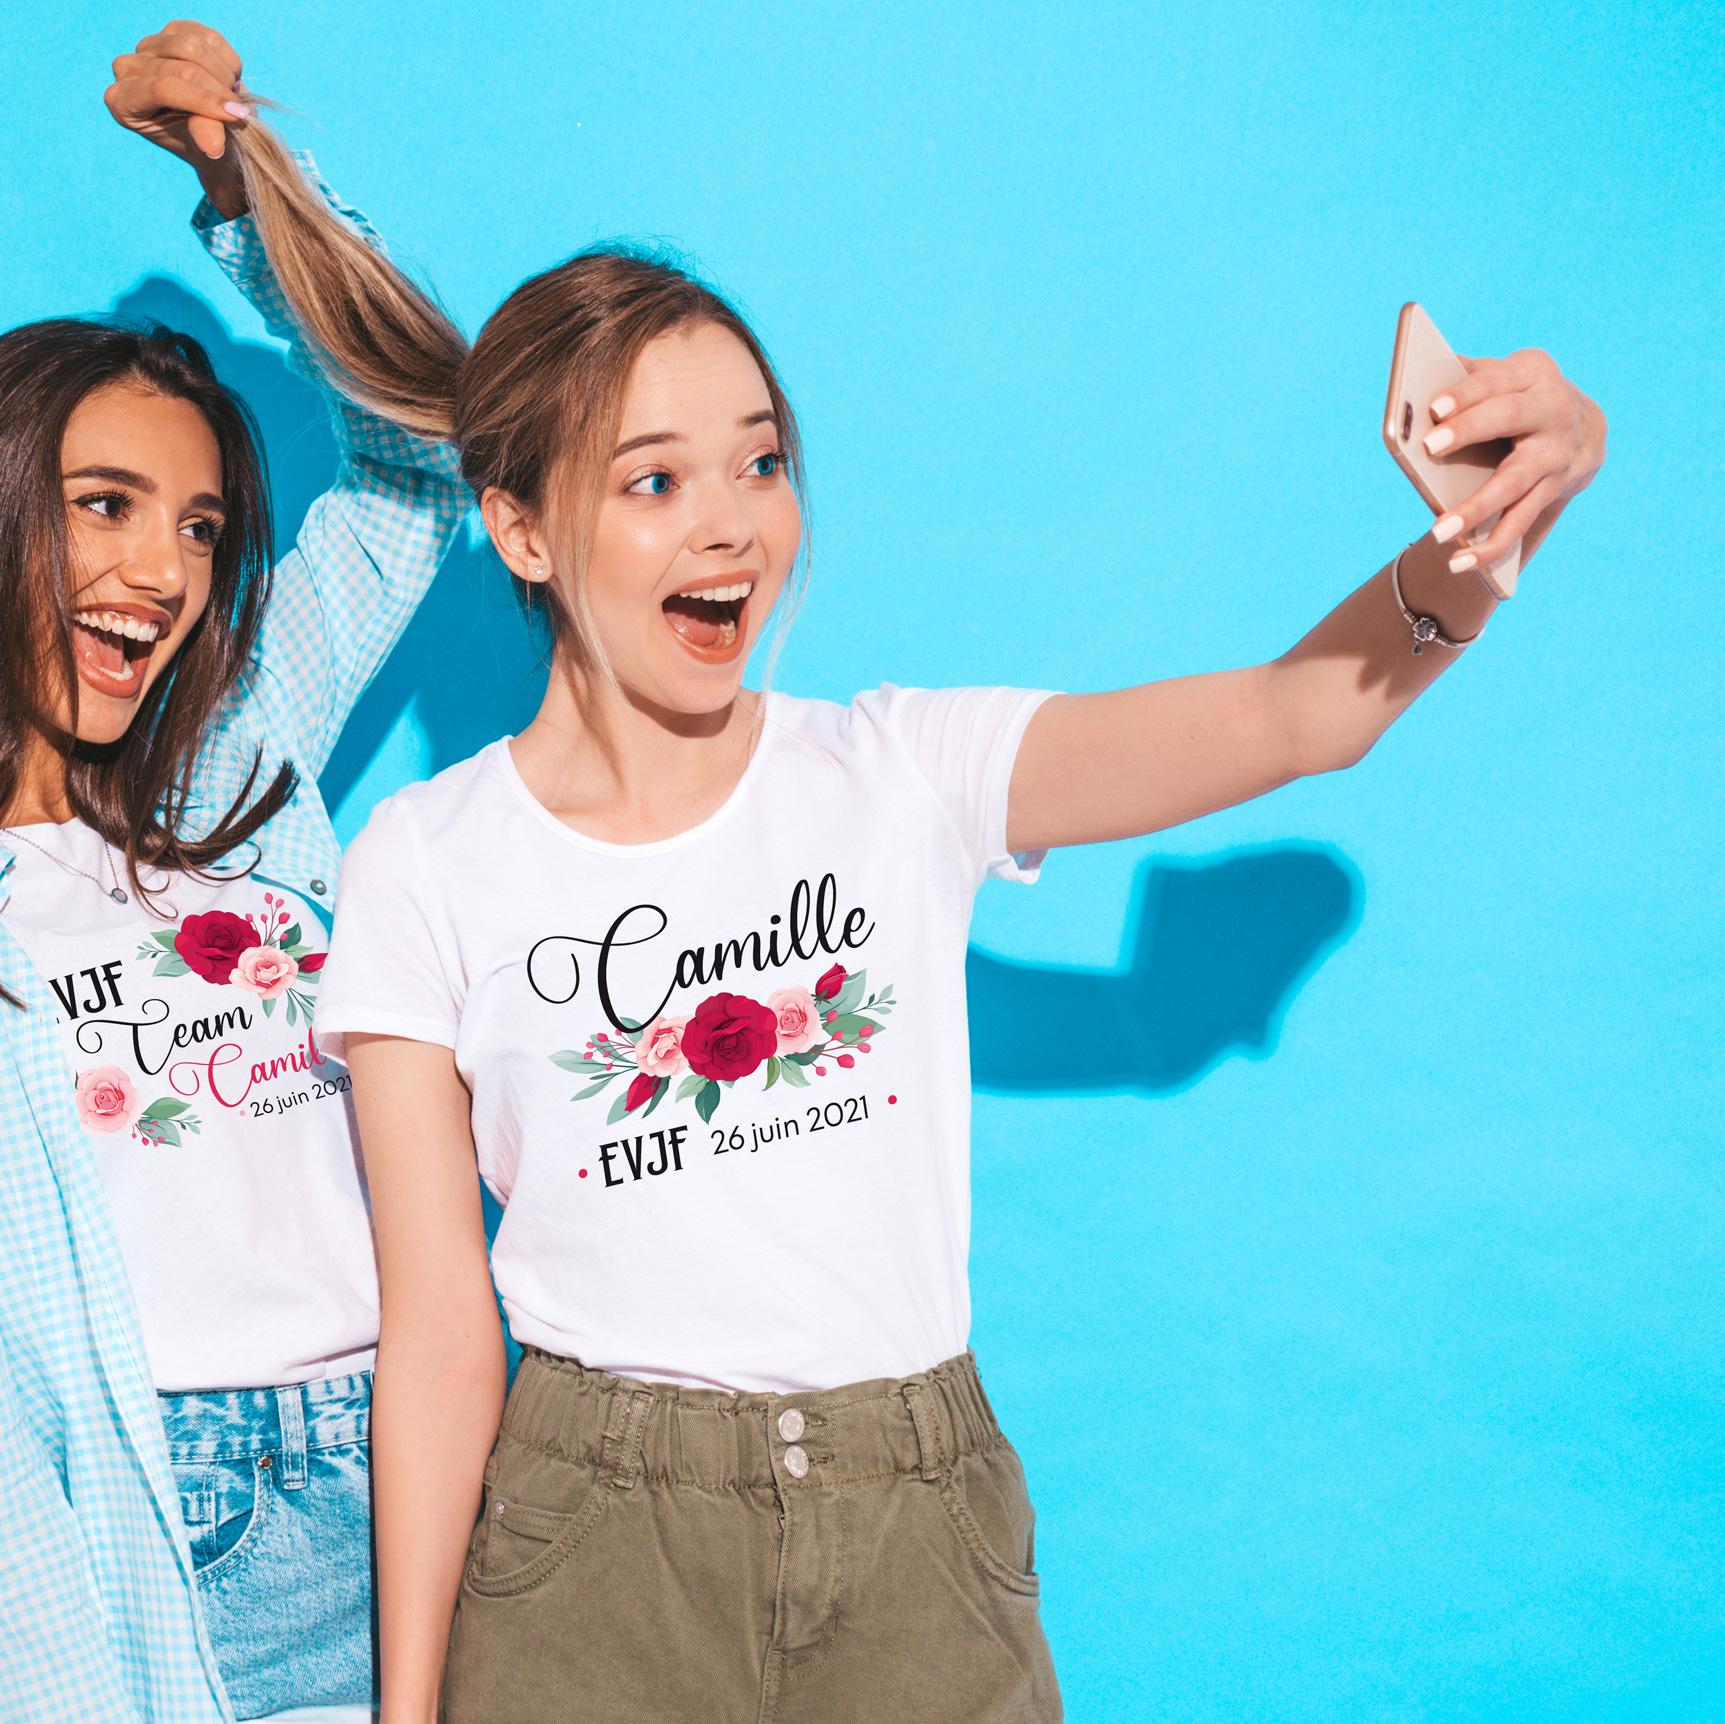 Collection Tee-shirts EVJF 2021